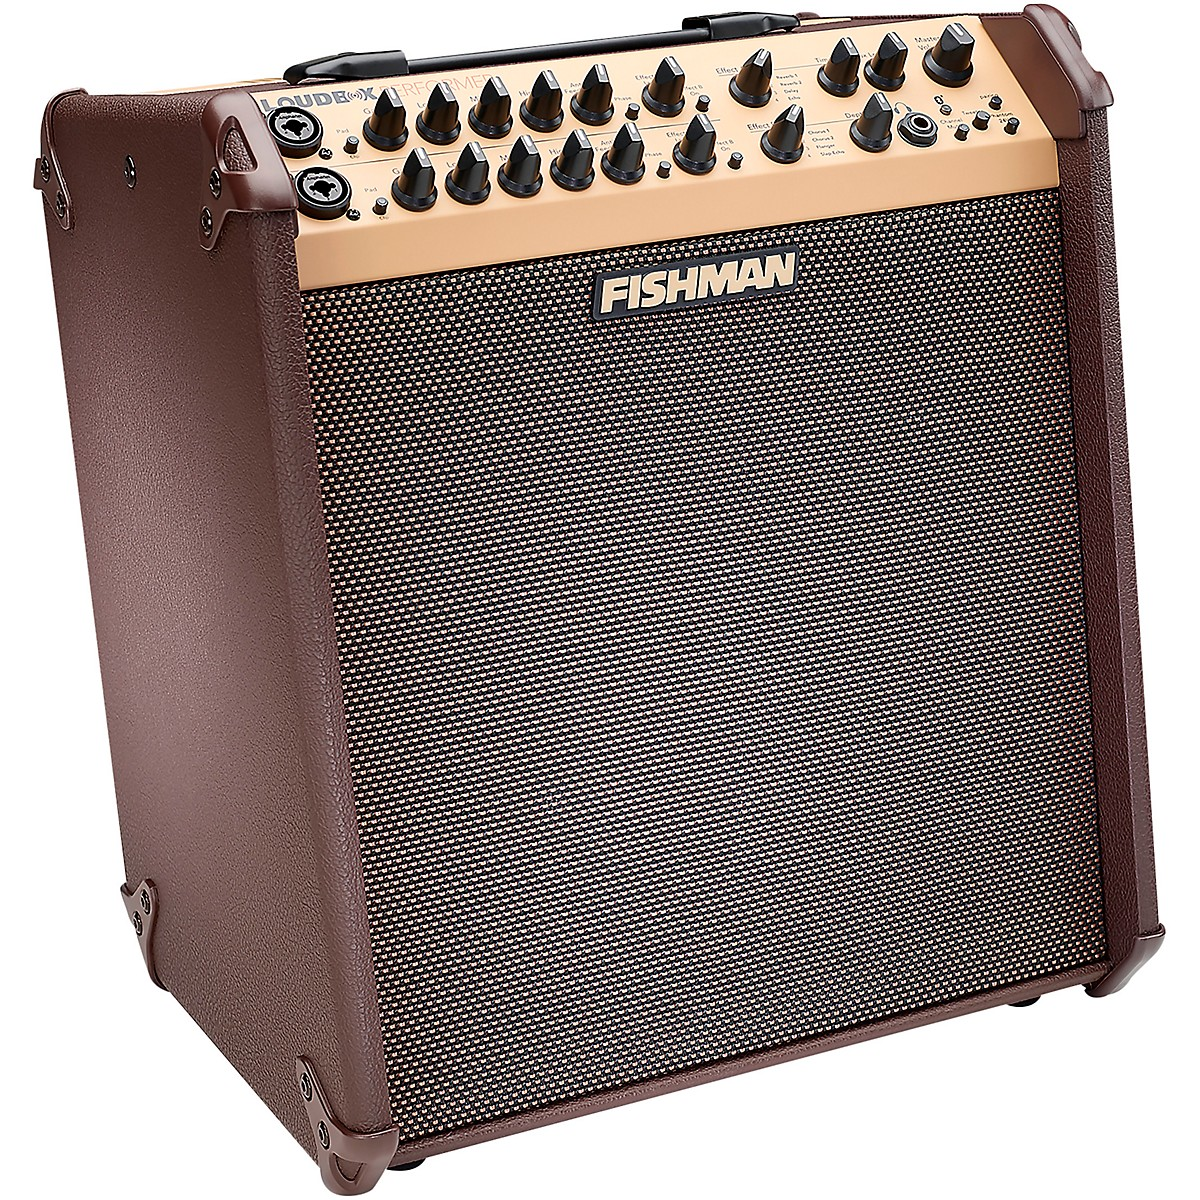 Fishman Loudbox Performer 180W Bluetooth Acoustic Guitar Combo Amp